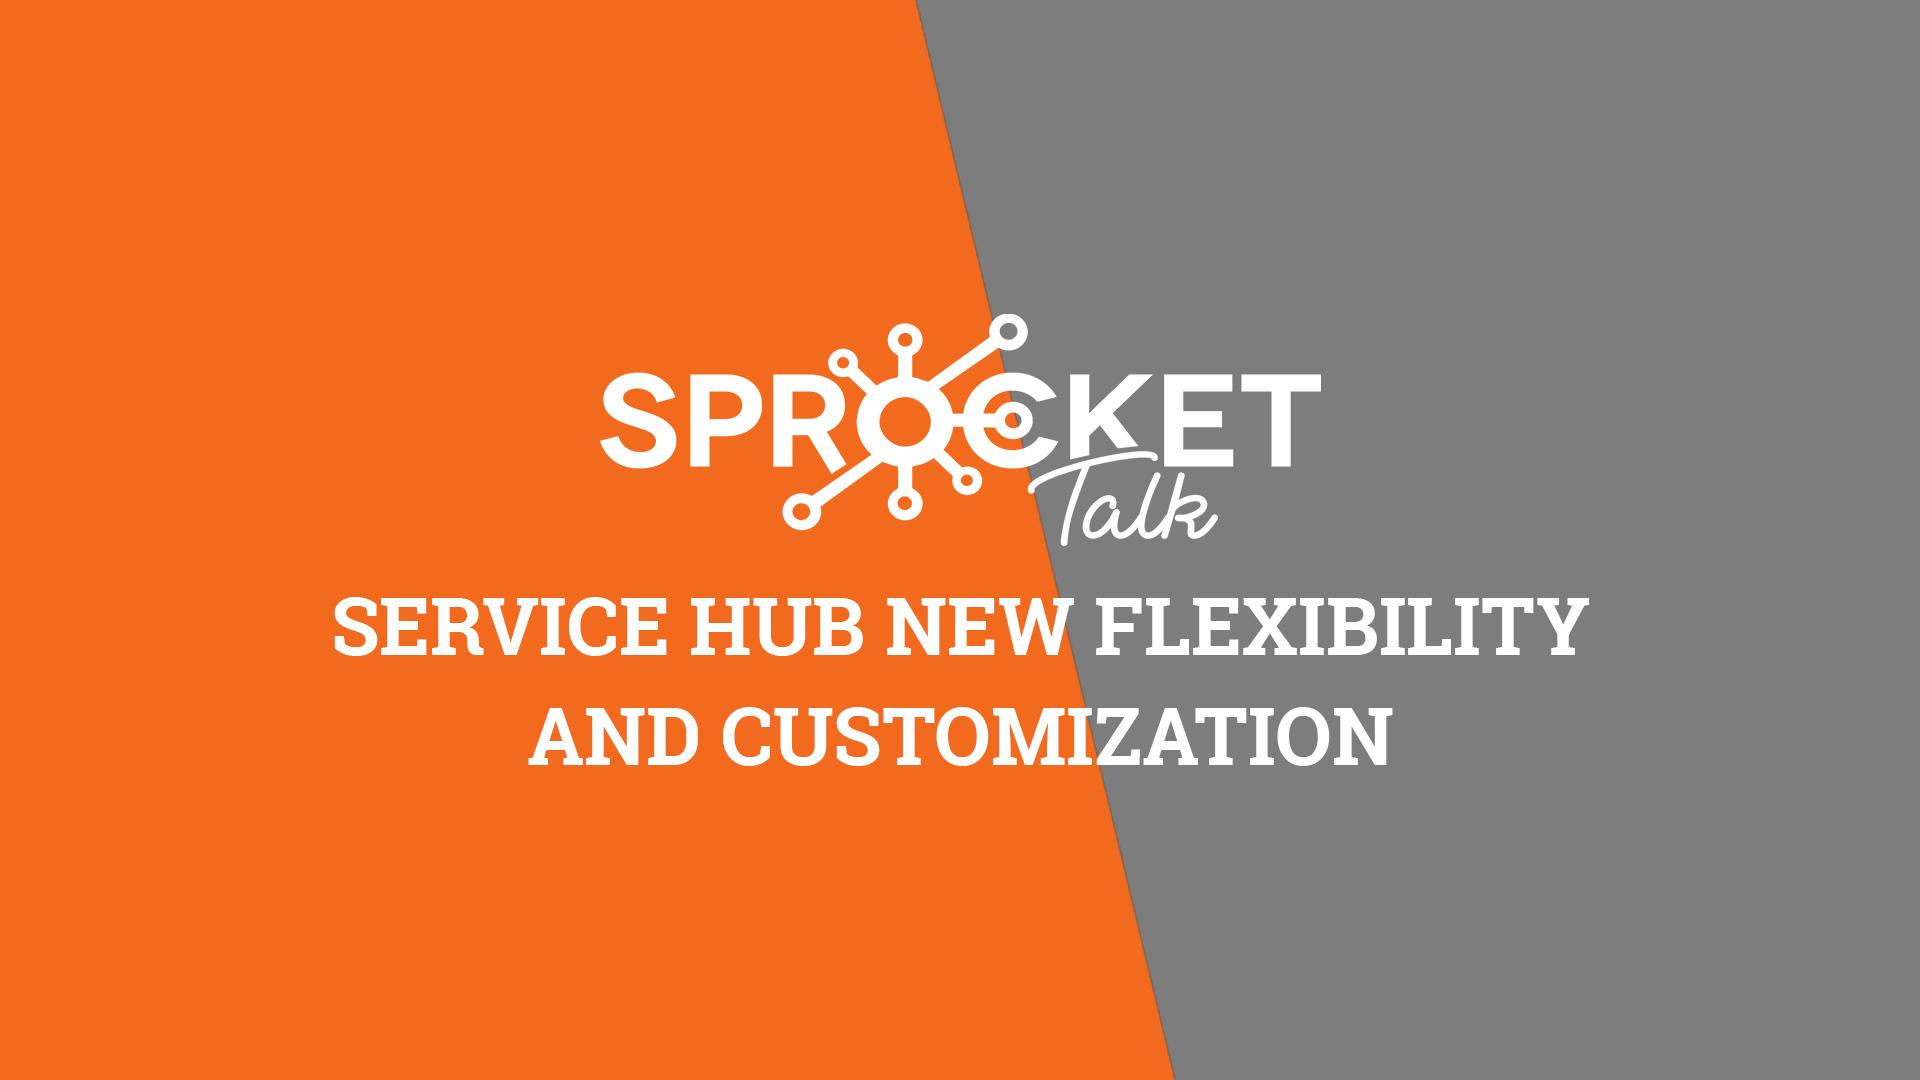 Service Hub New Flexibility and Customization